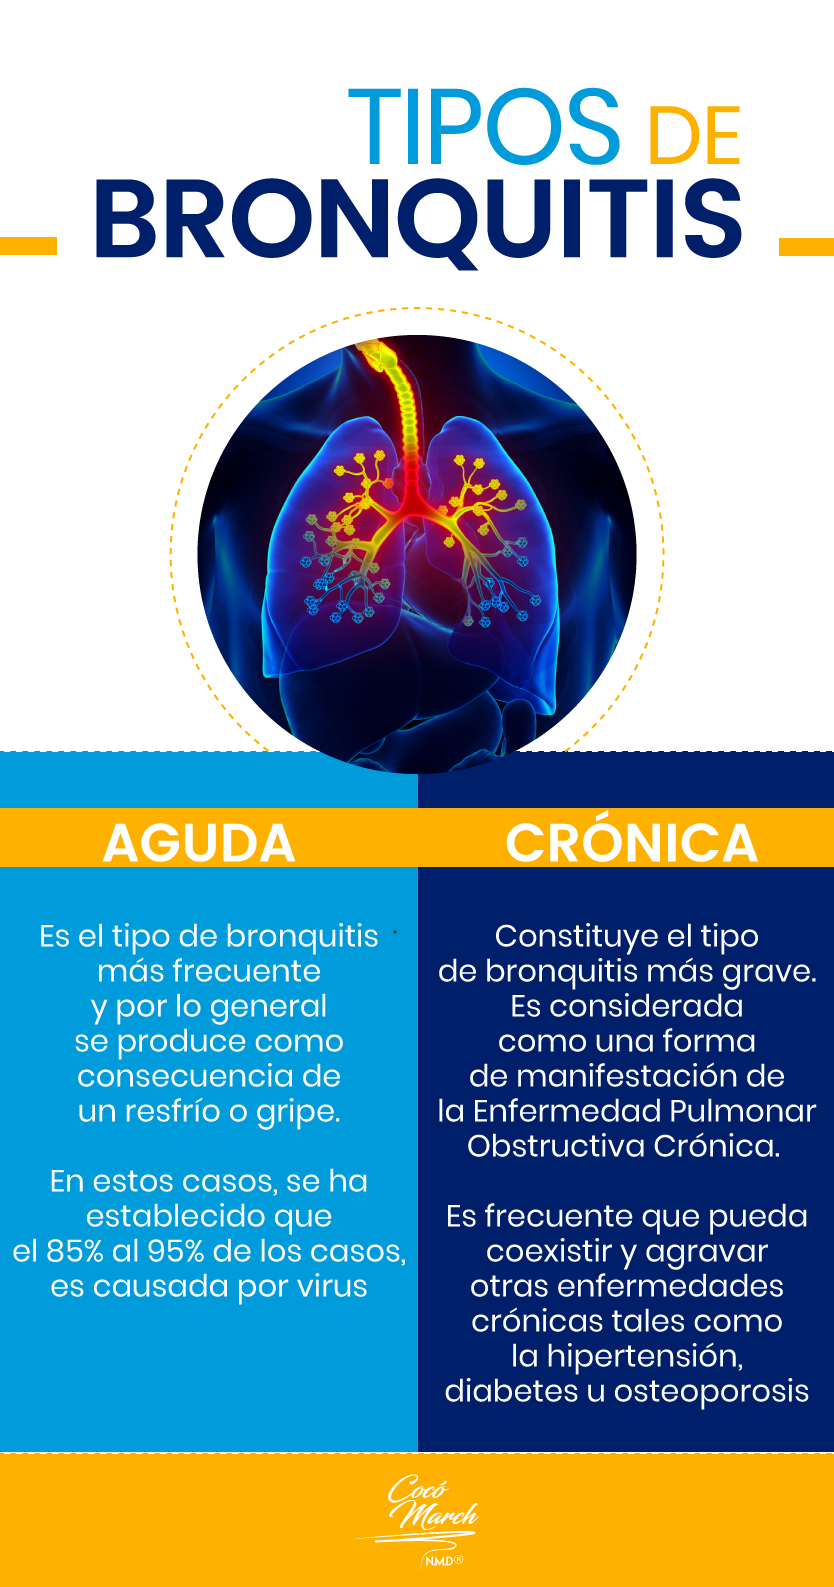 bronquitis-tipos